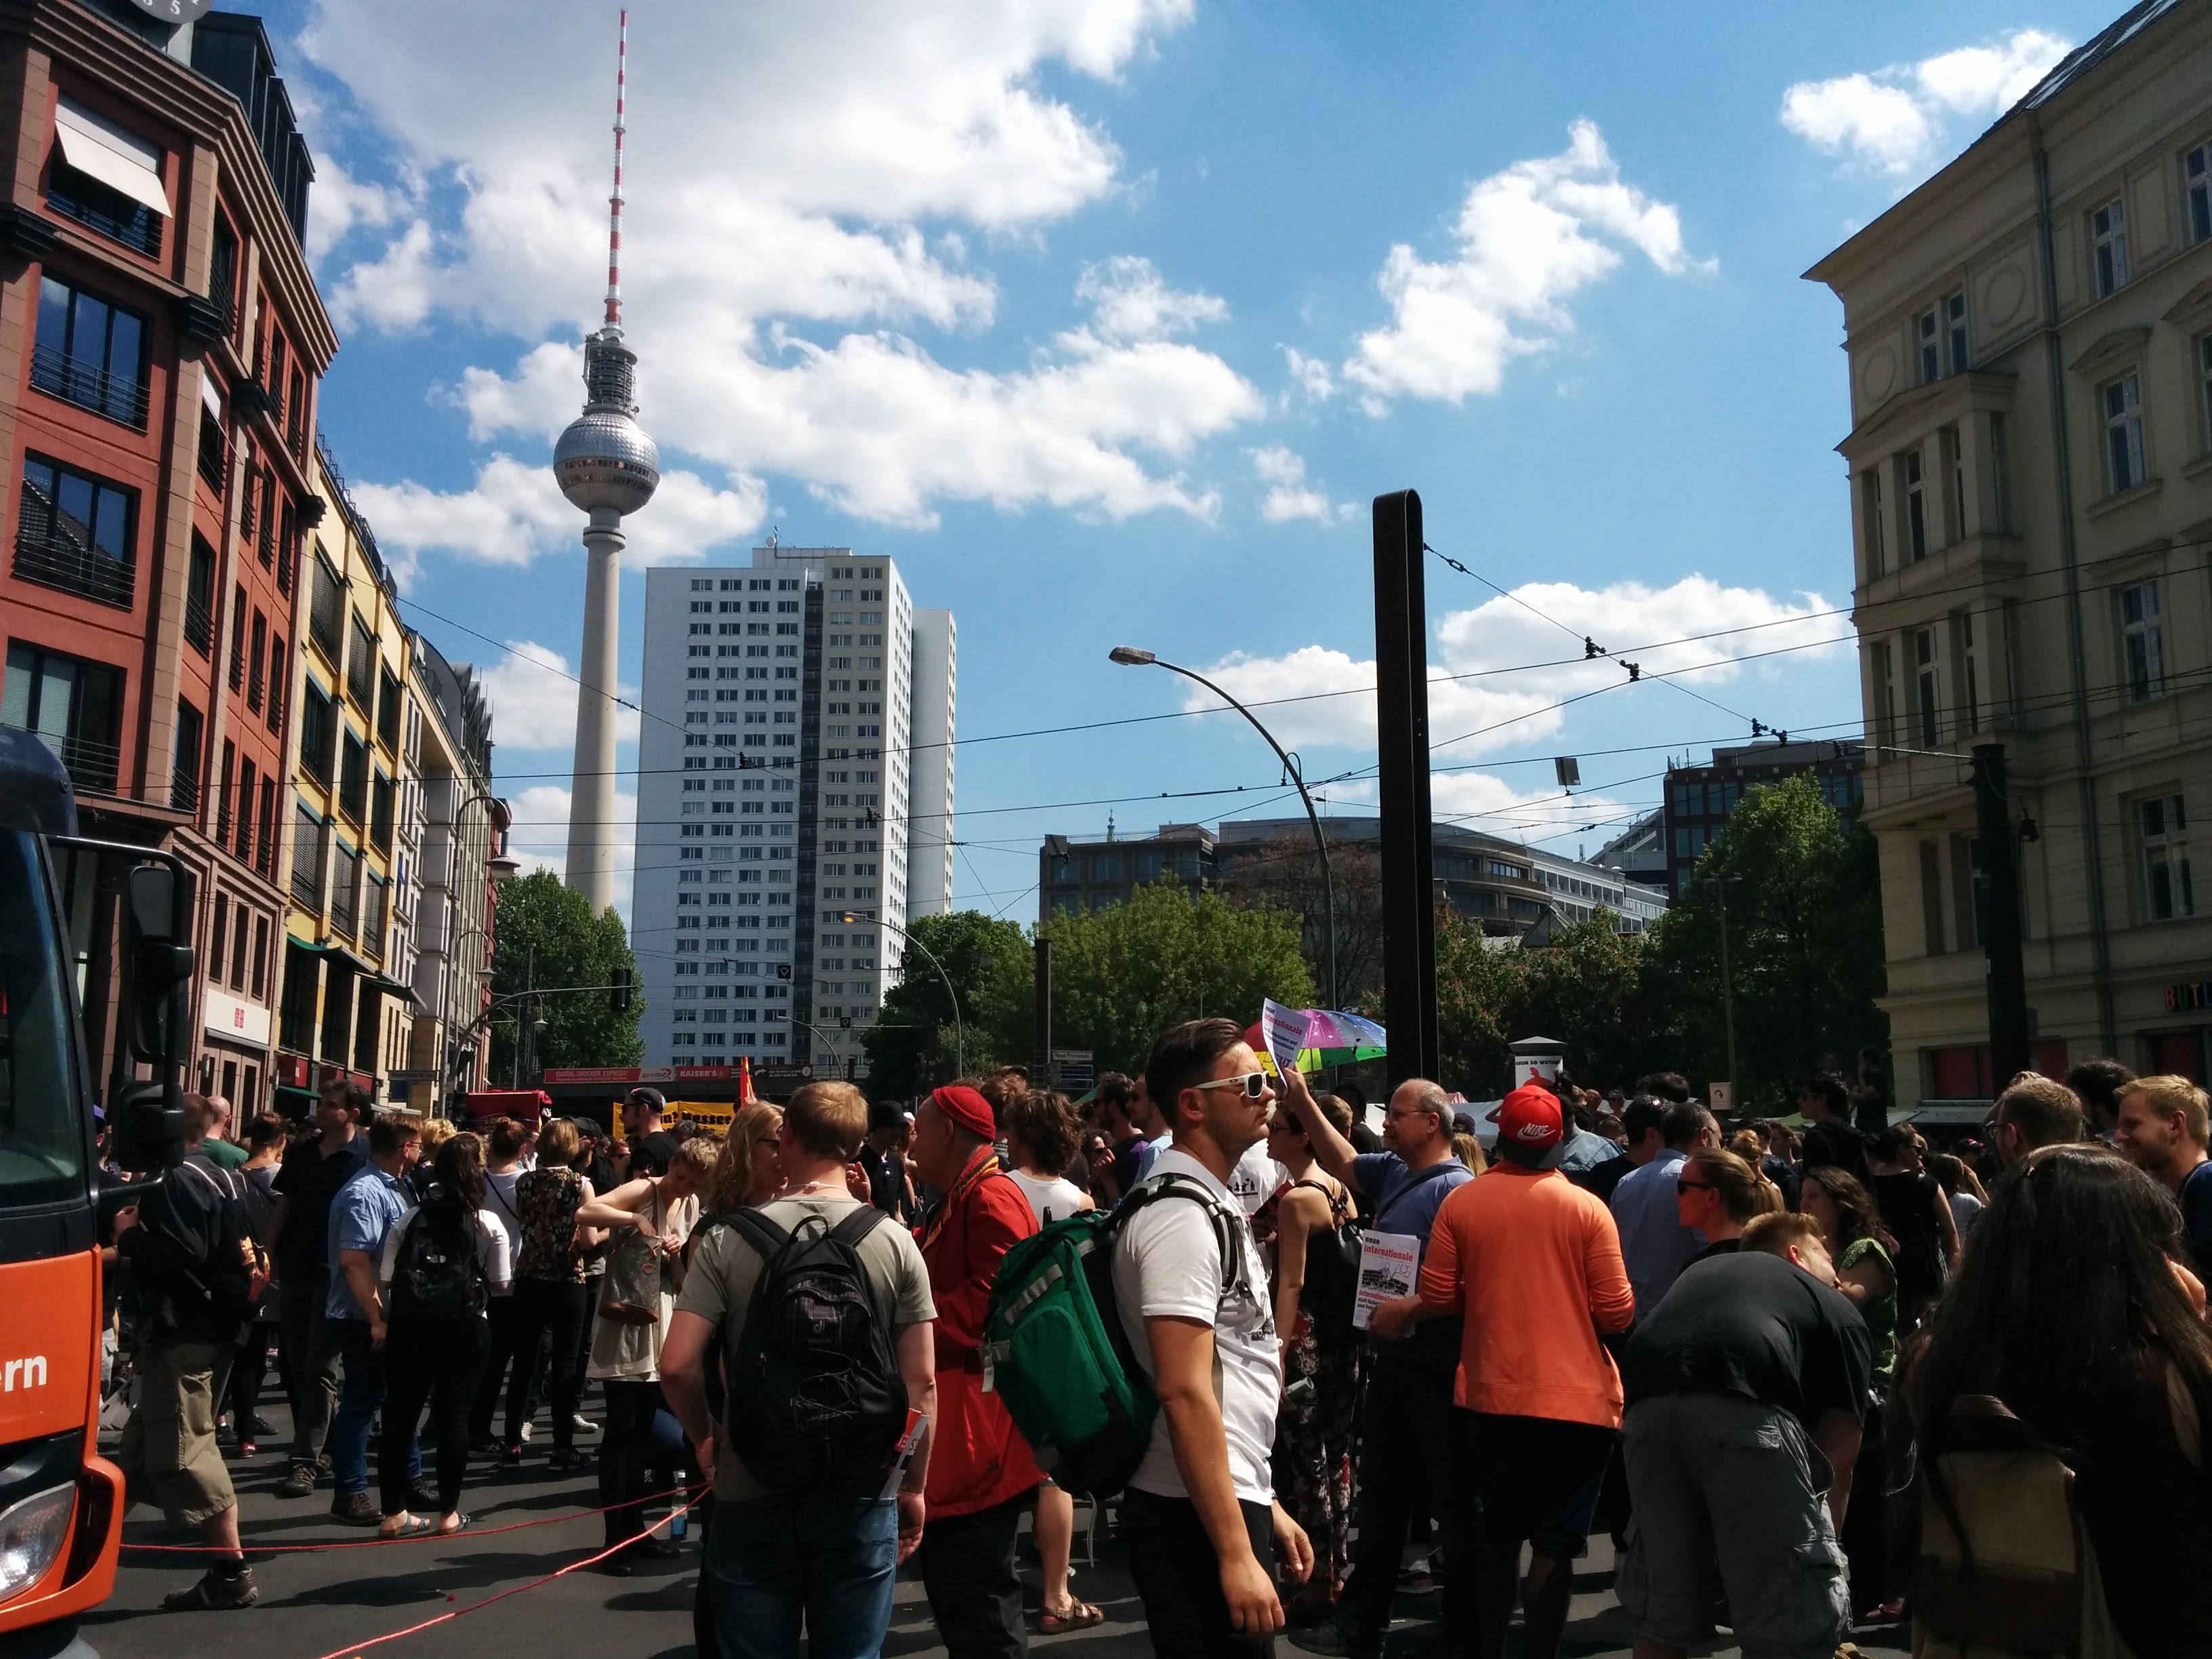 Anti-Nazi, pro-refugee demonstration